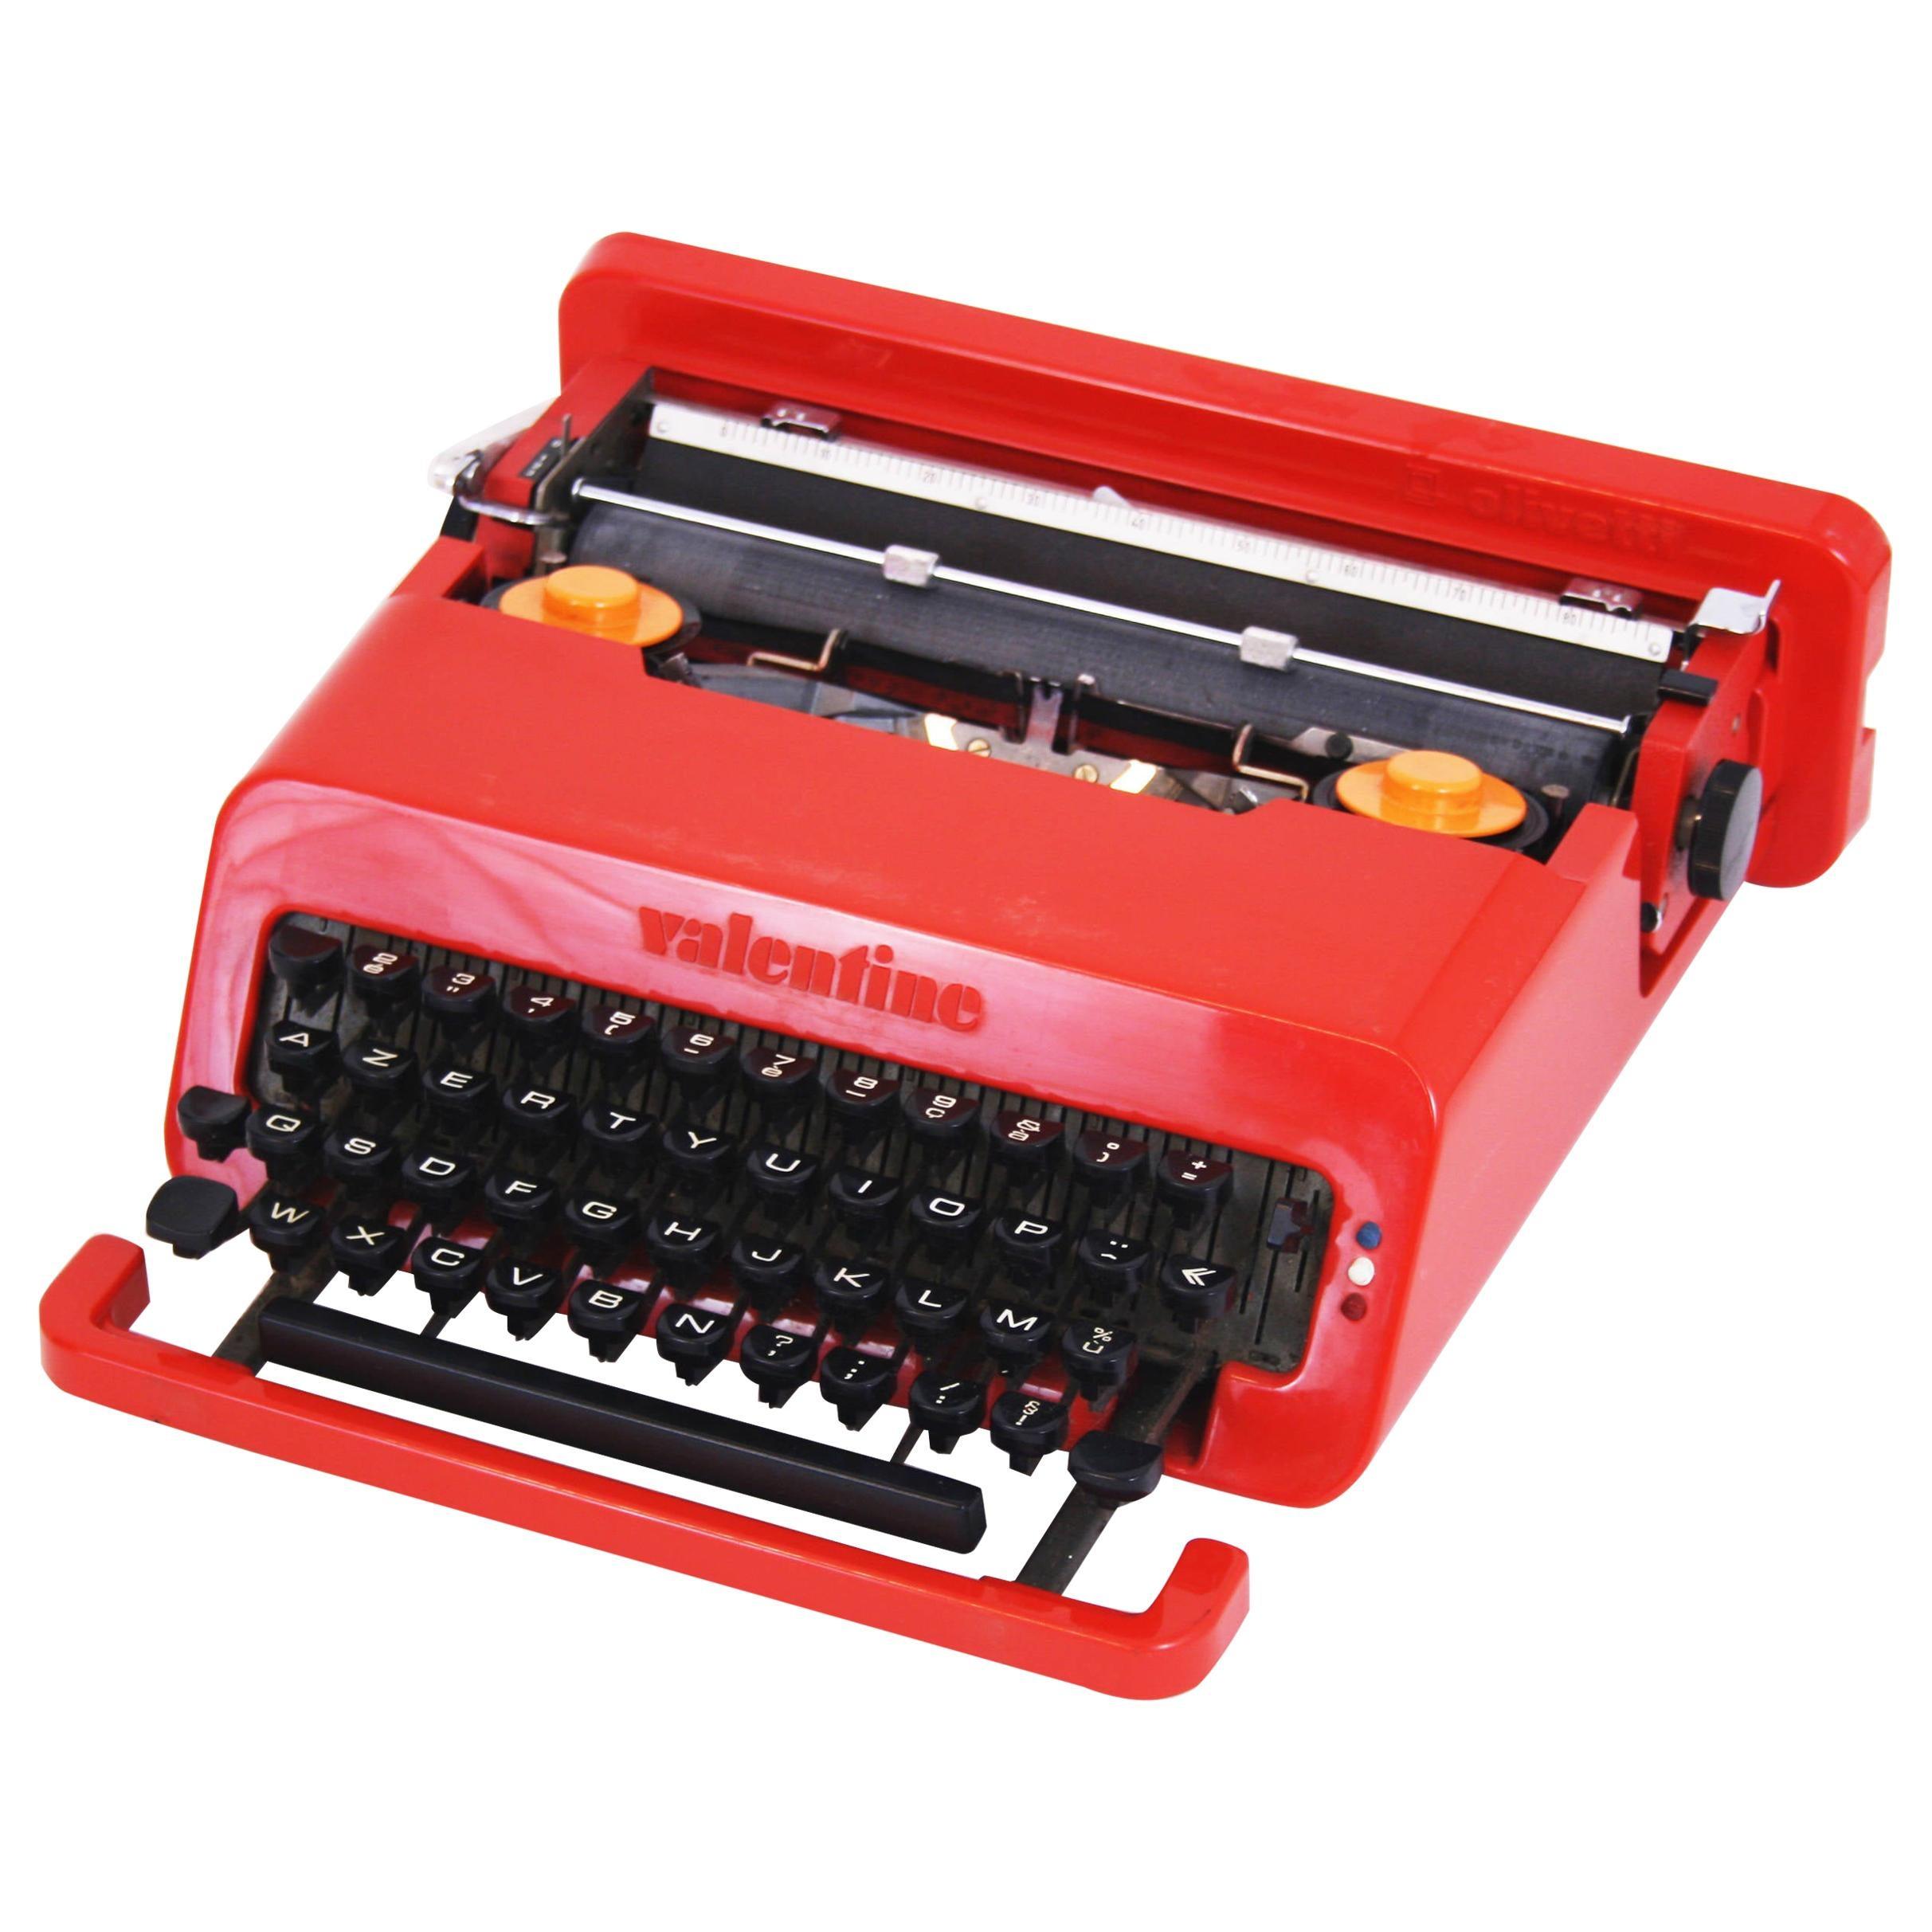 Typewriter Olivetti Valentine Iconic Design by Ettore Sottsass, Italy, 1970s